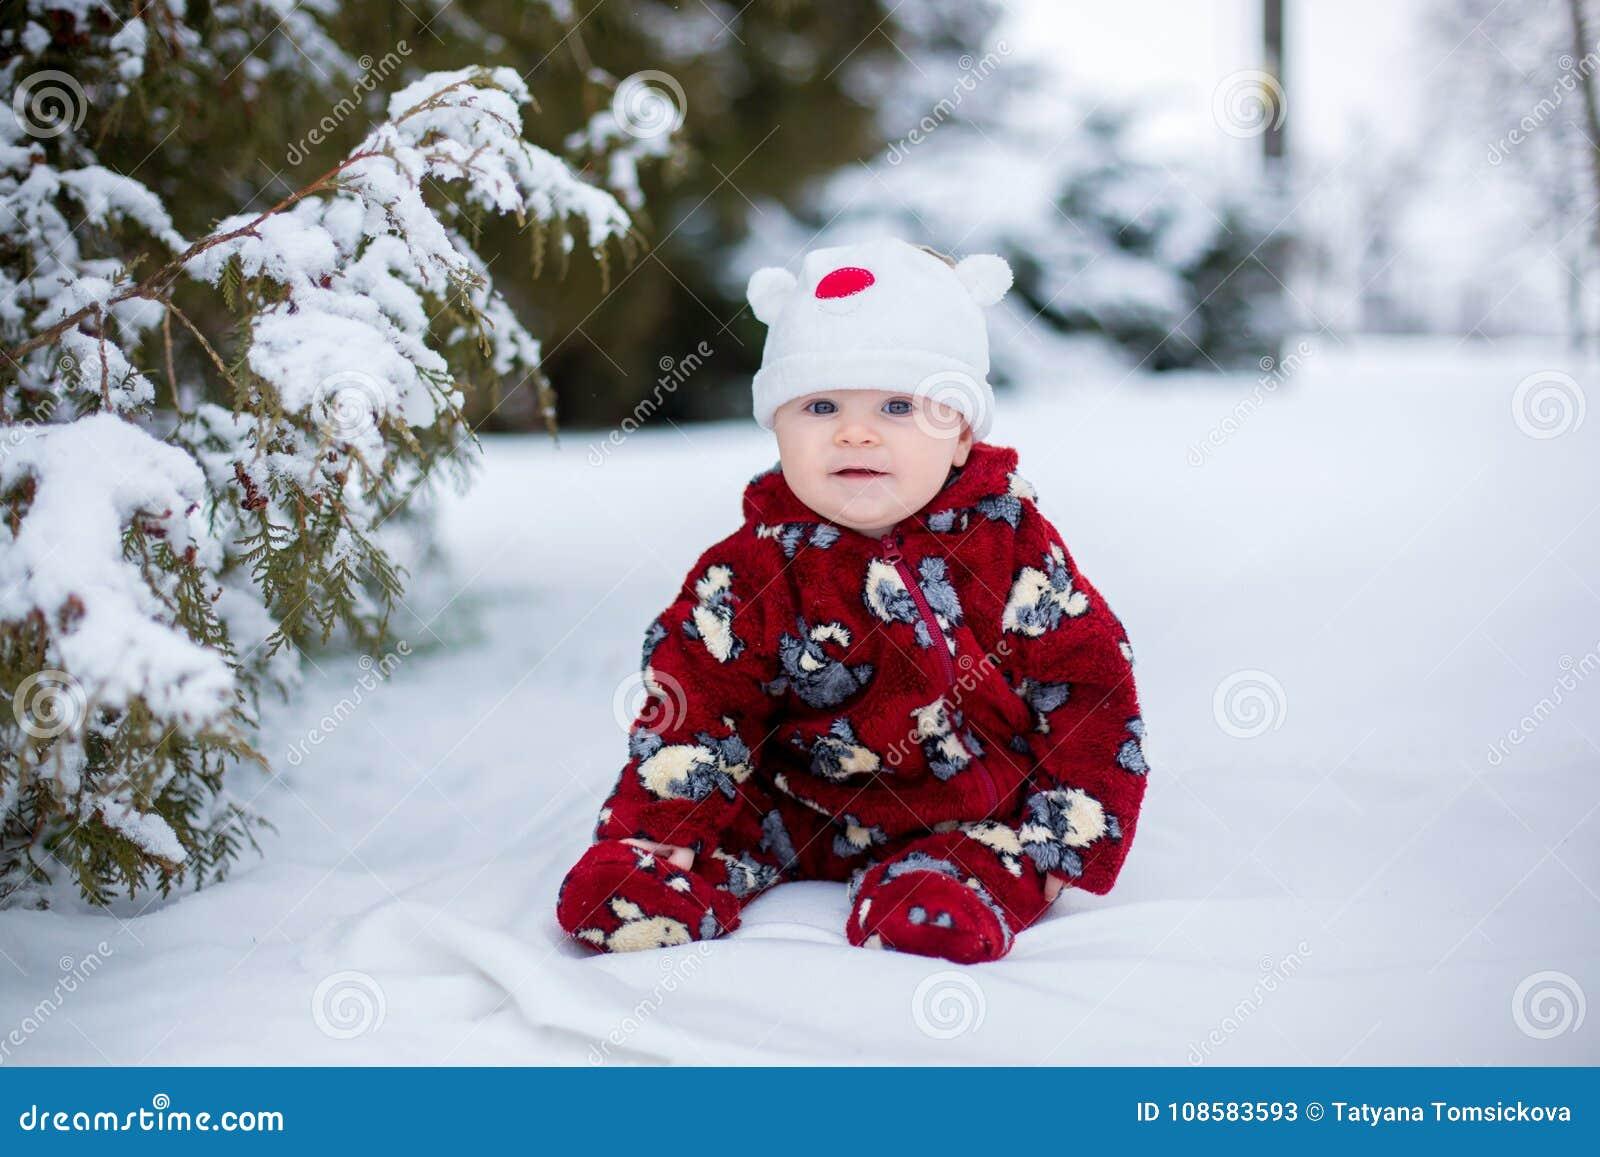 bcdbac35d Little Cute Smiling Baby Boy